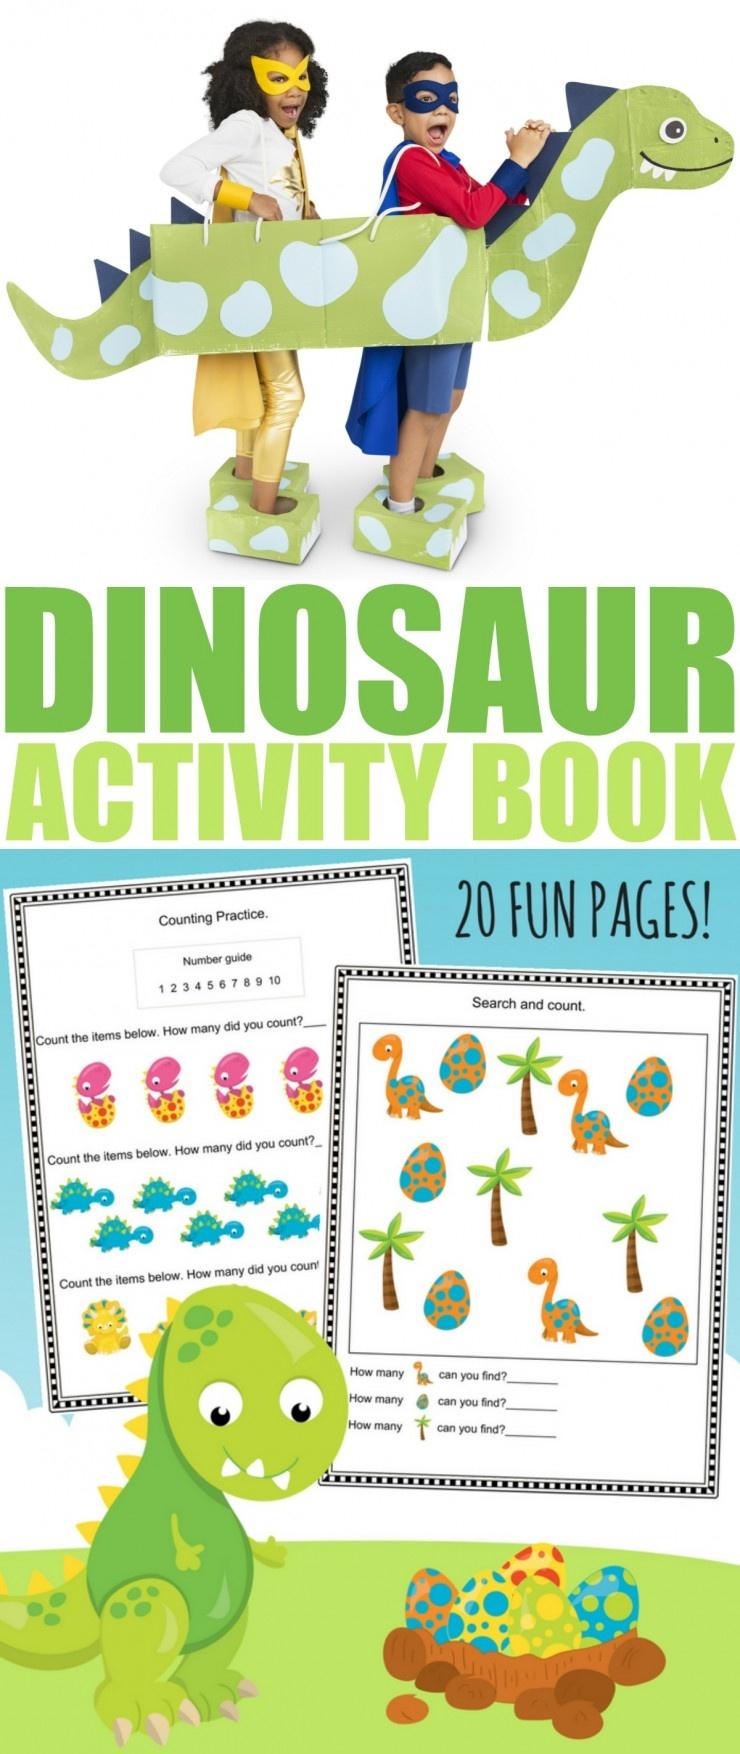 Free Printable Dinosaur Activity Book - Frugal Mom Eh! - Free Printable Books For Kindergarten